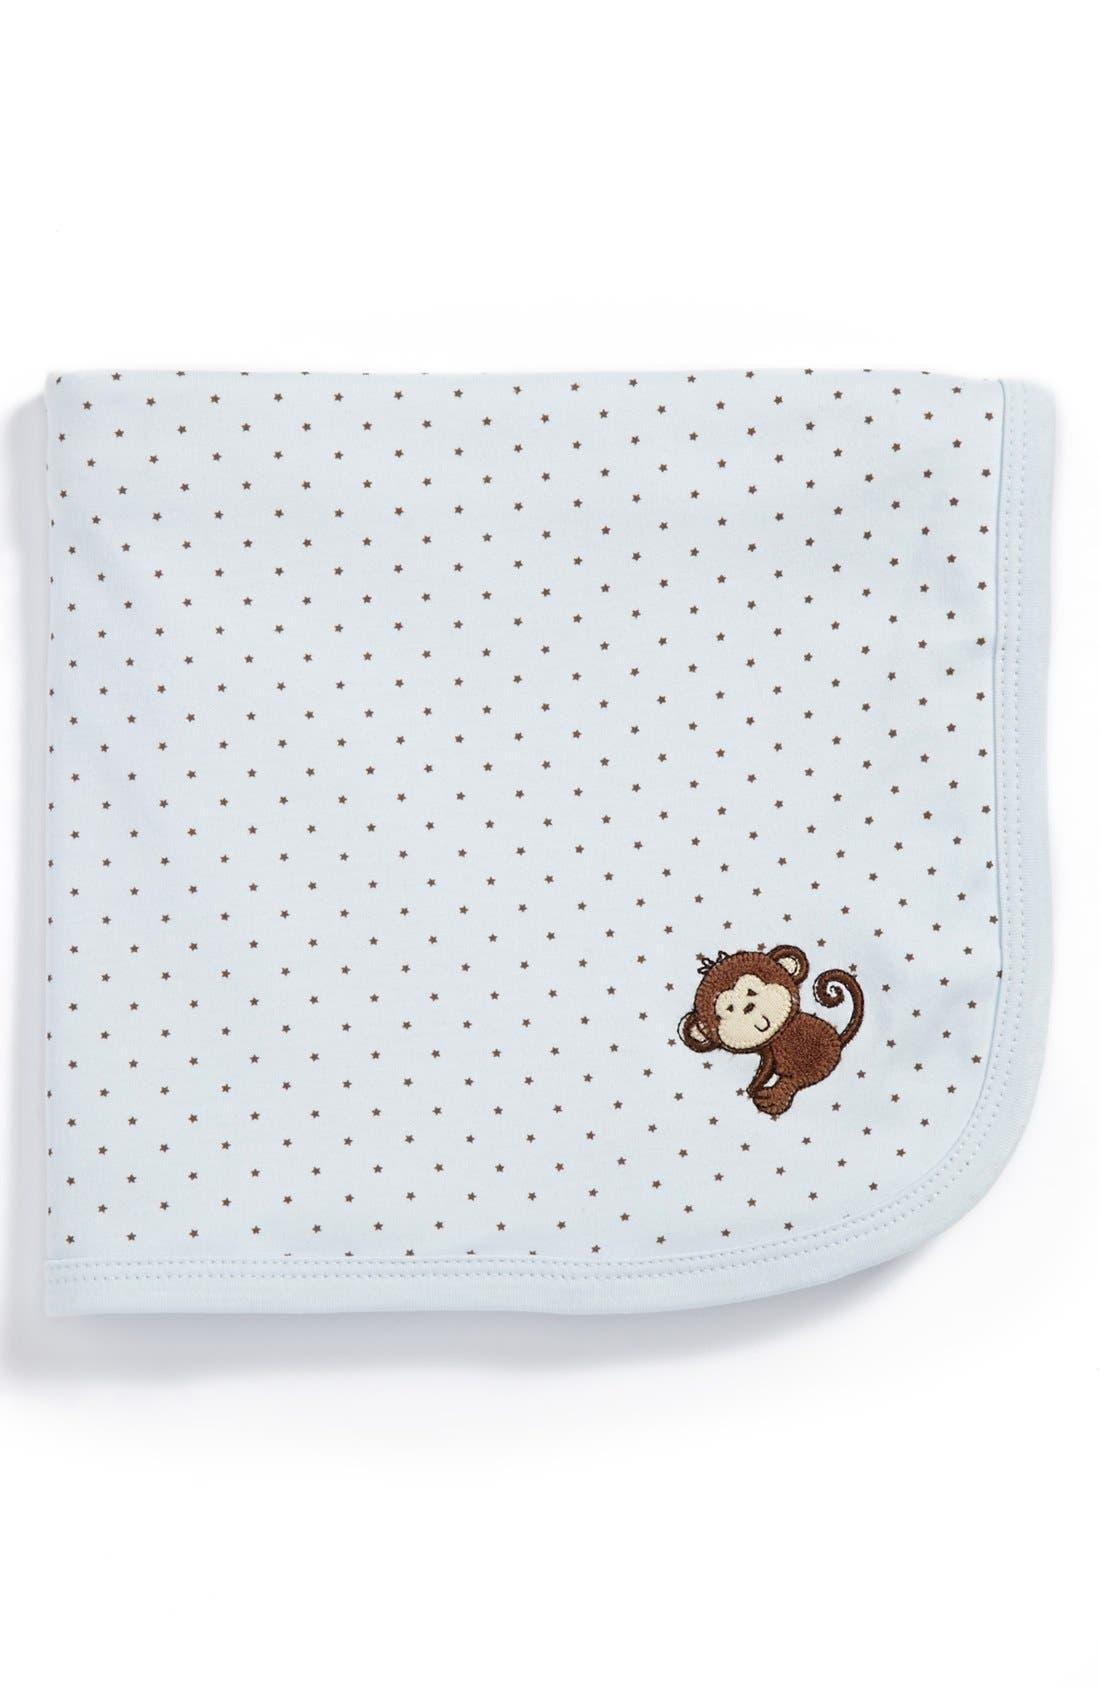 Alternate Image 1 Selected - Little Me 'Monkey Star' Receiving Blanket